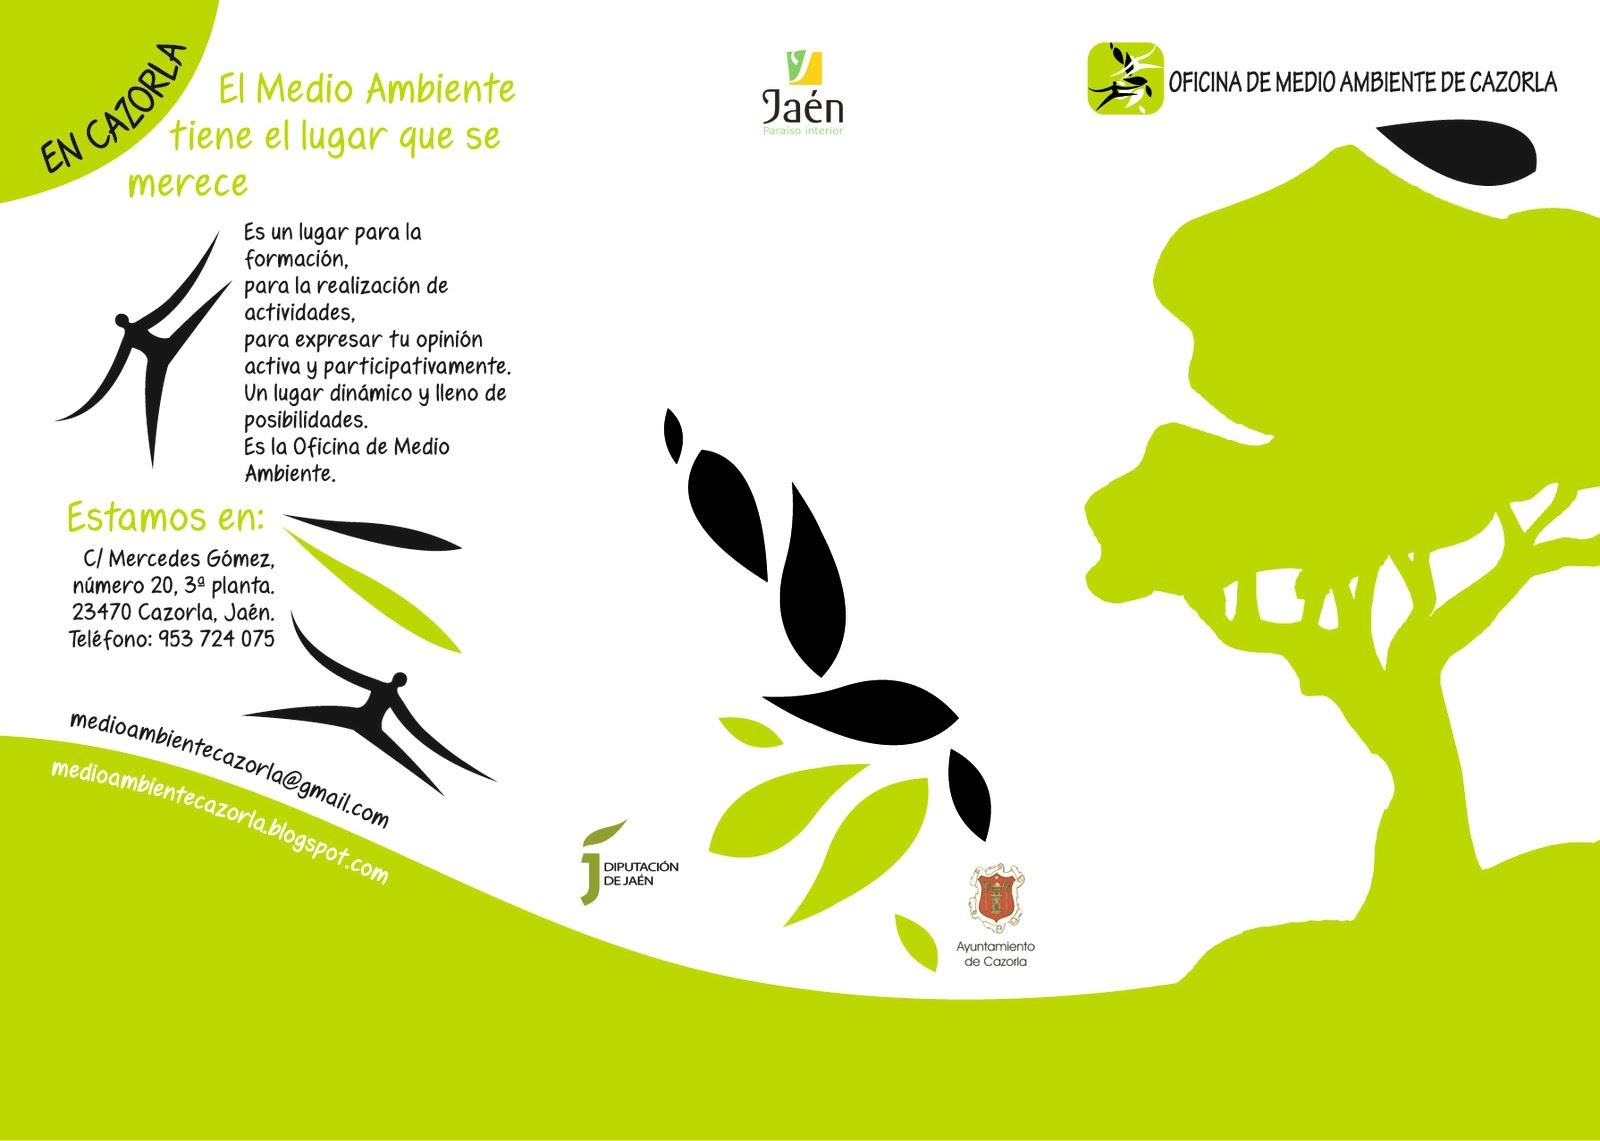 folleto_oficina_medio_ambiente_cazorla